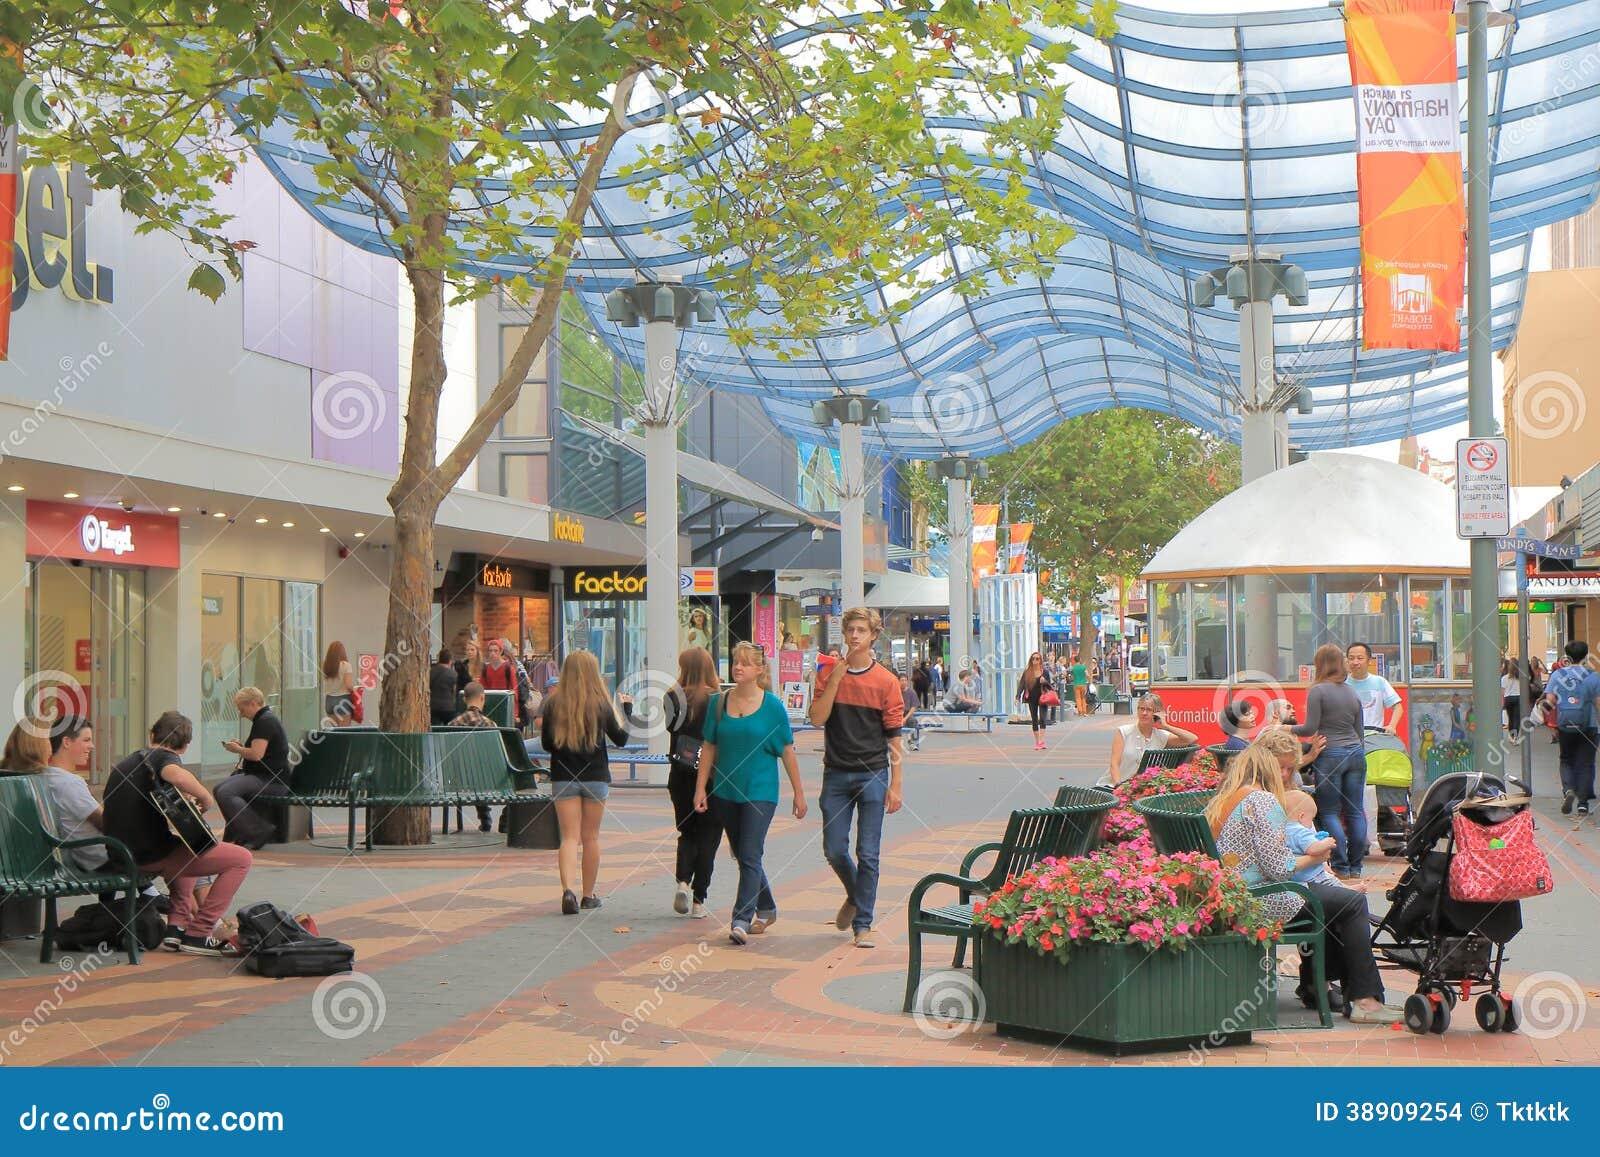 Market garden business plan